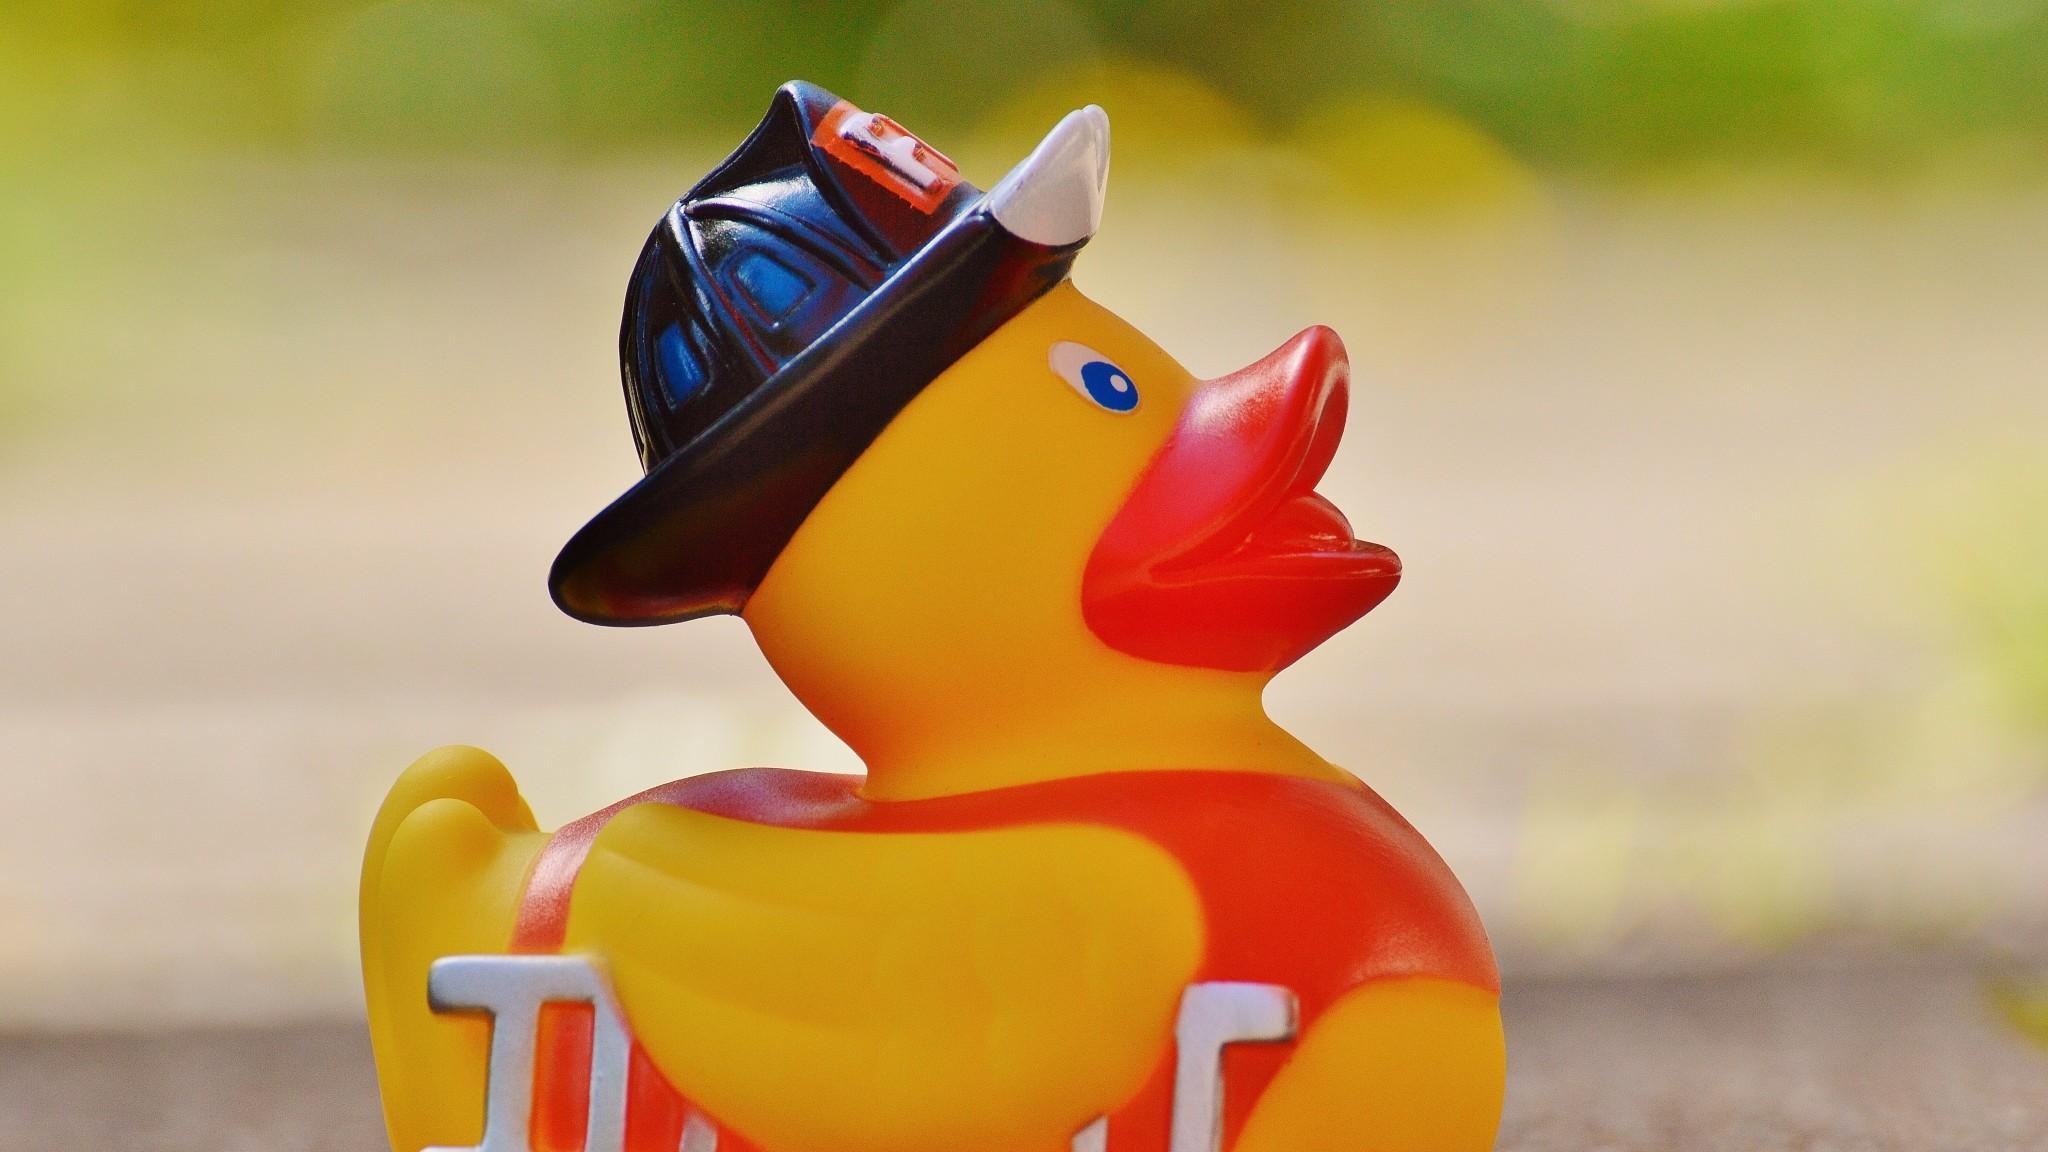 Wallpaper rubber duck, duck, toy